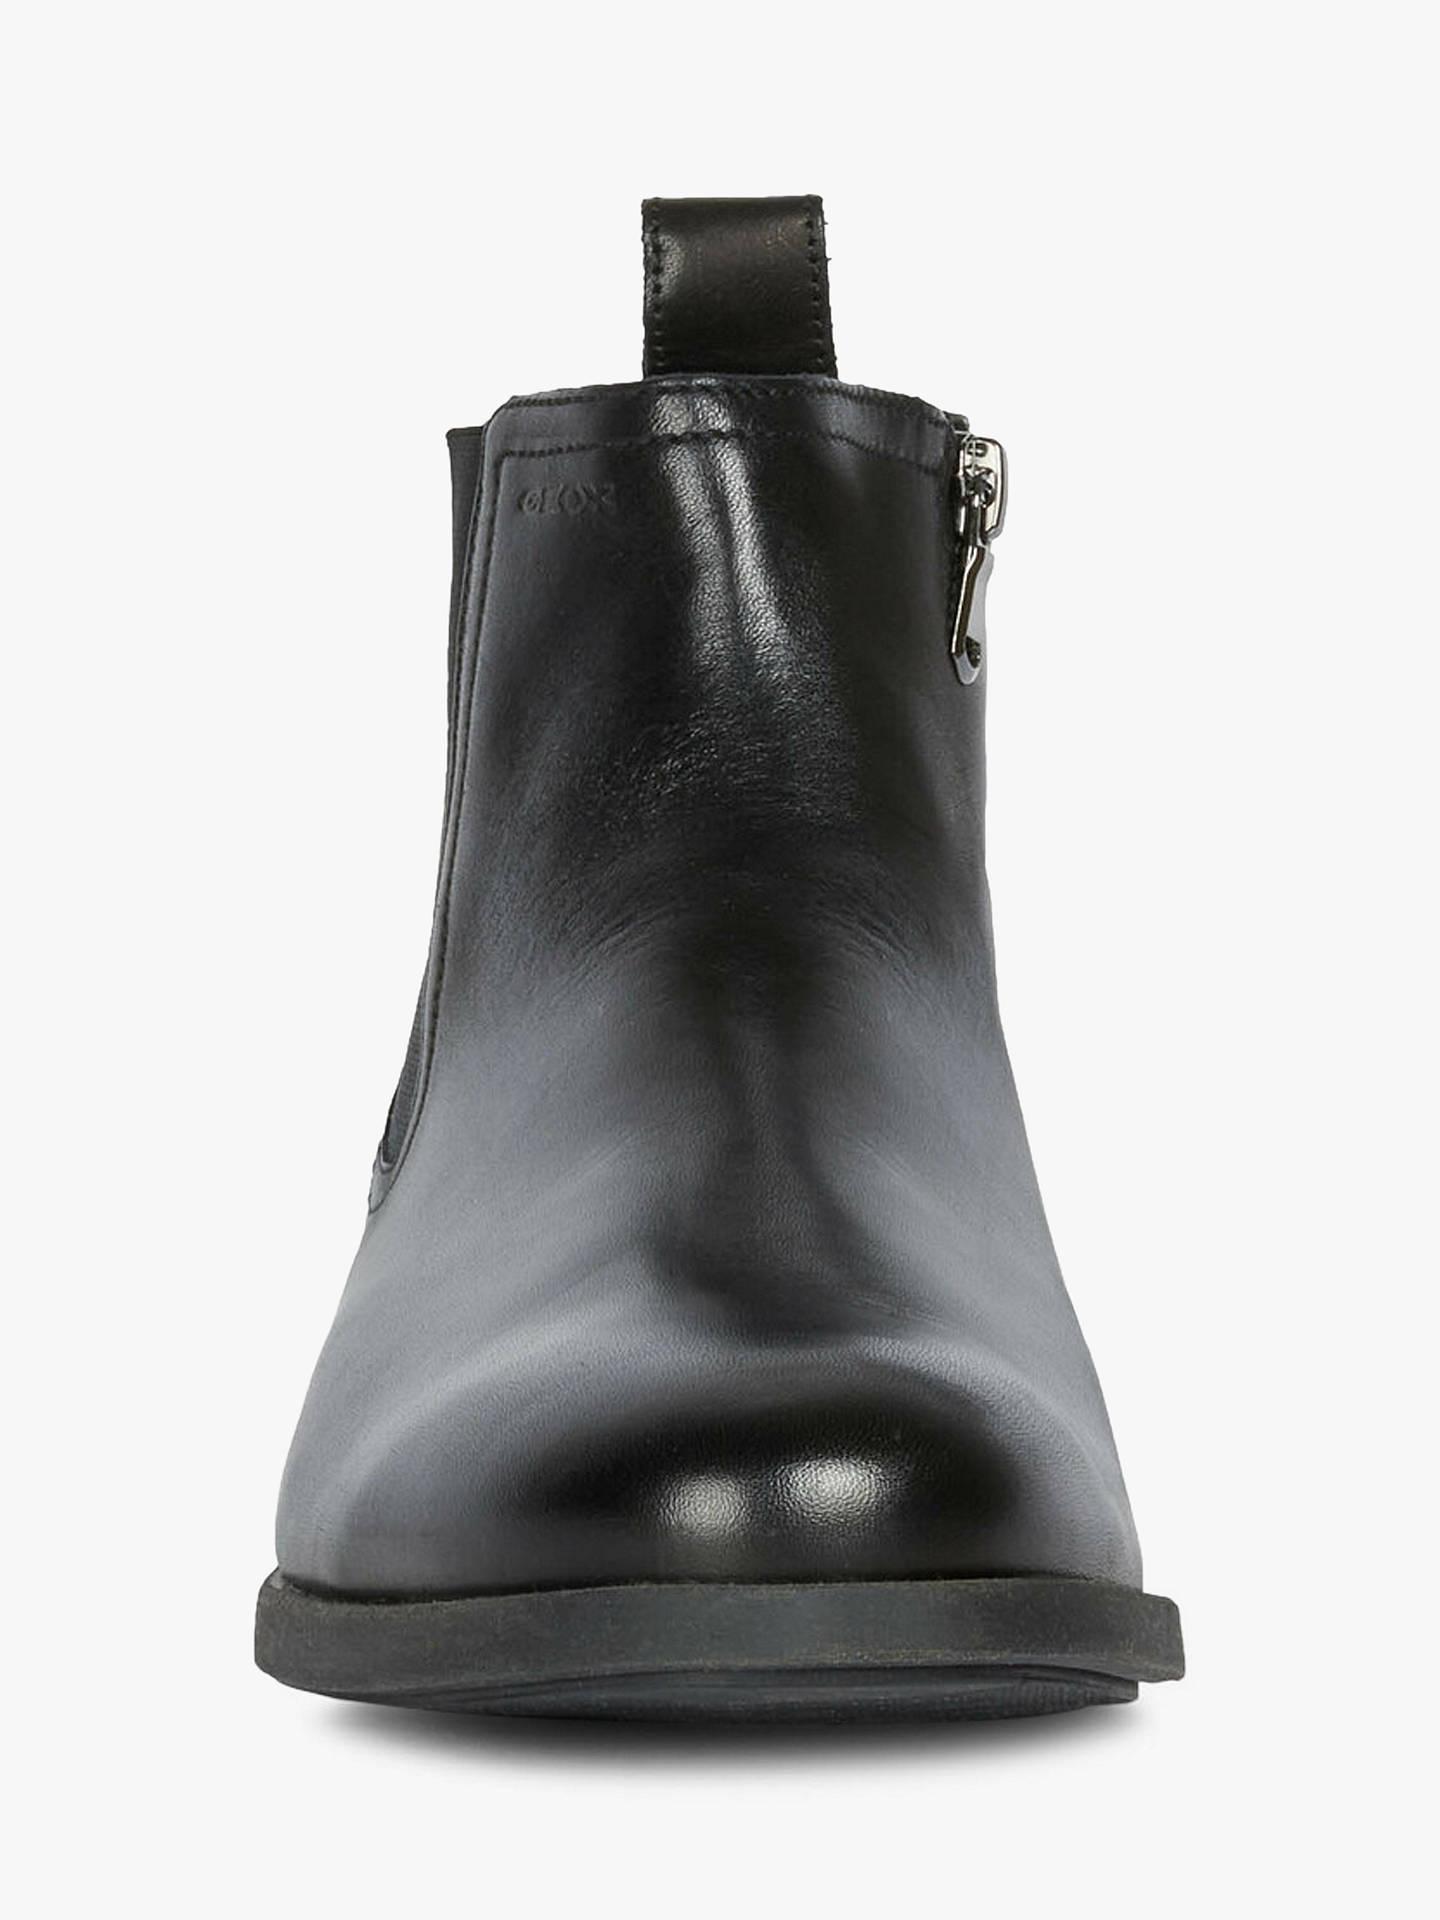 Geox Kaspar Leather Chelsea Boots, Black